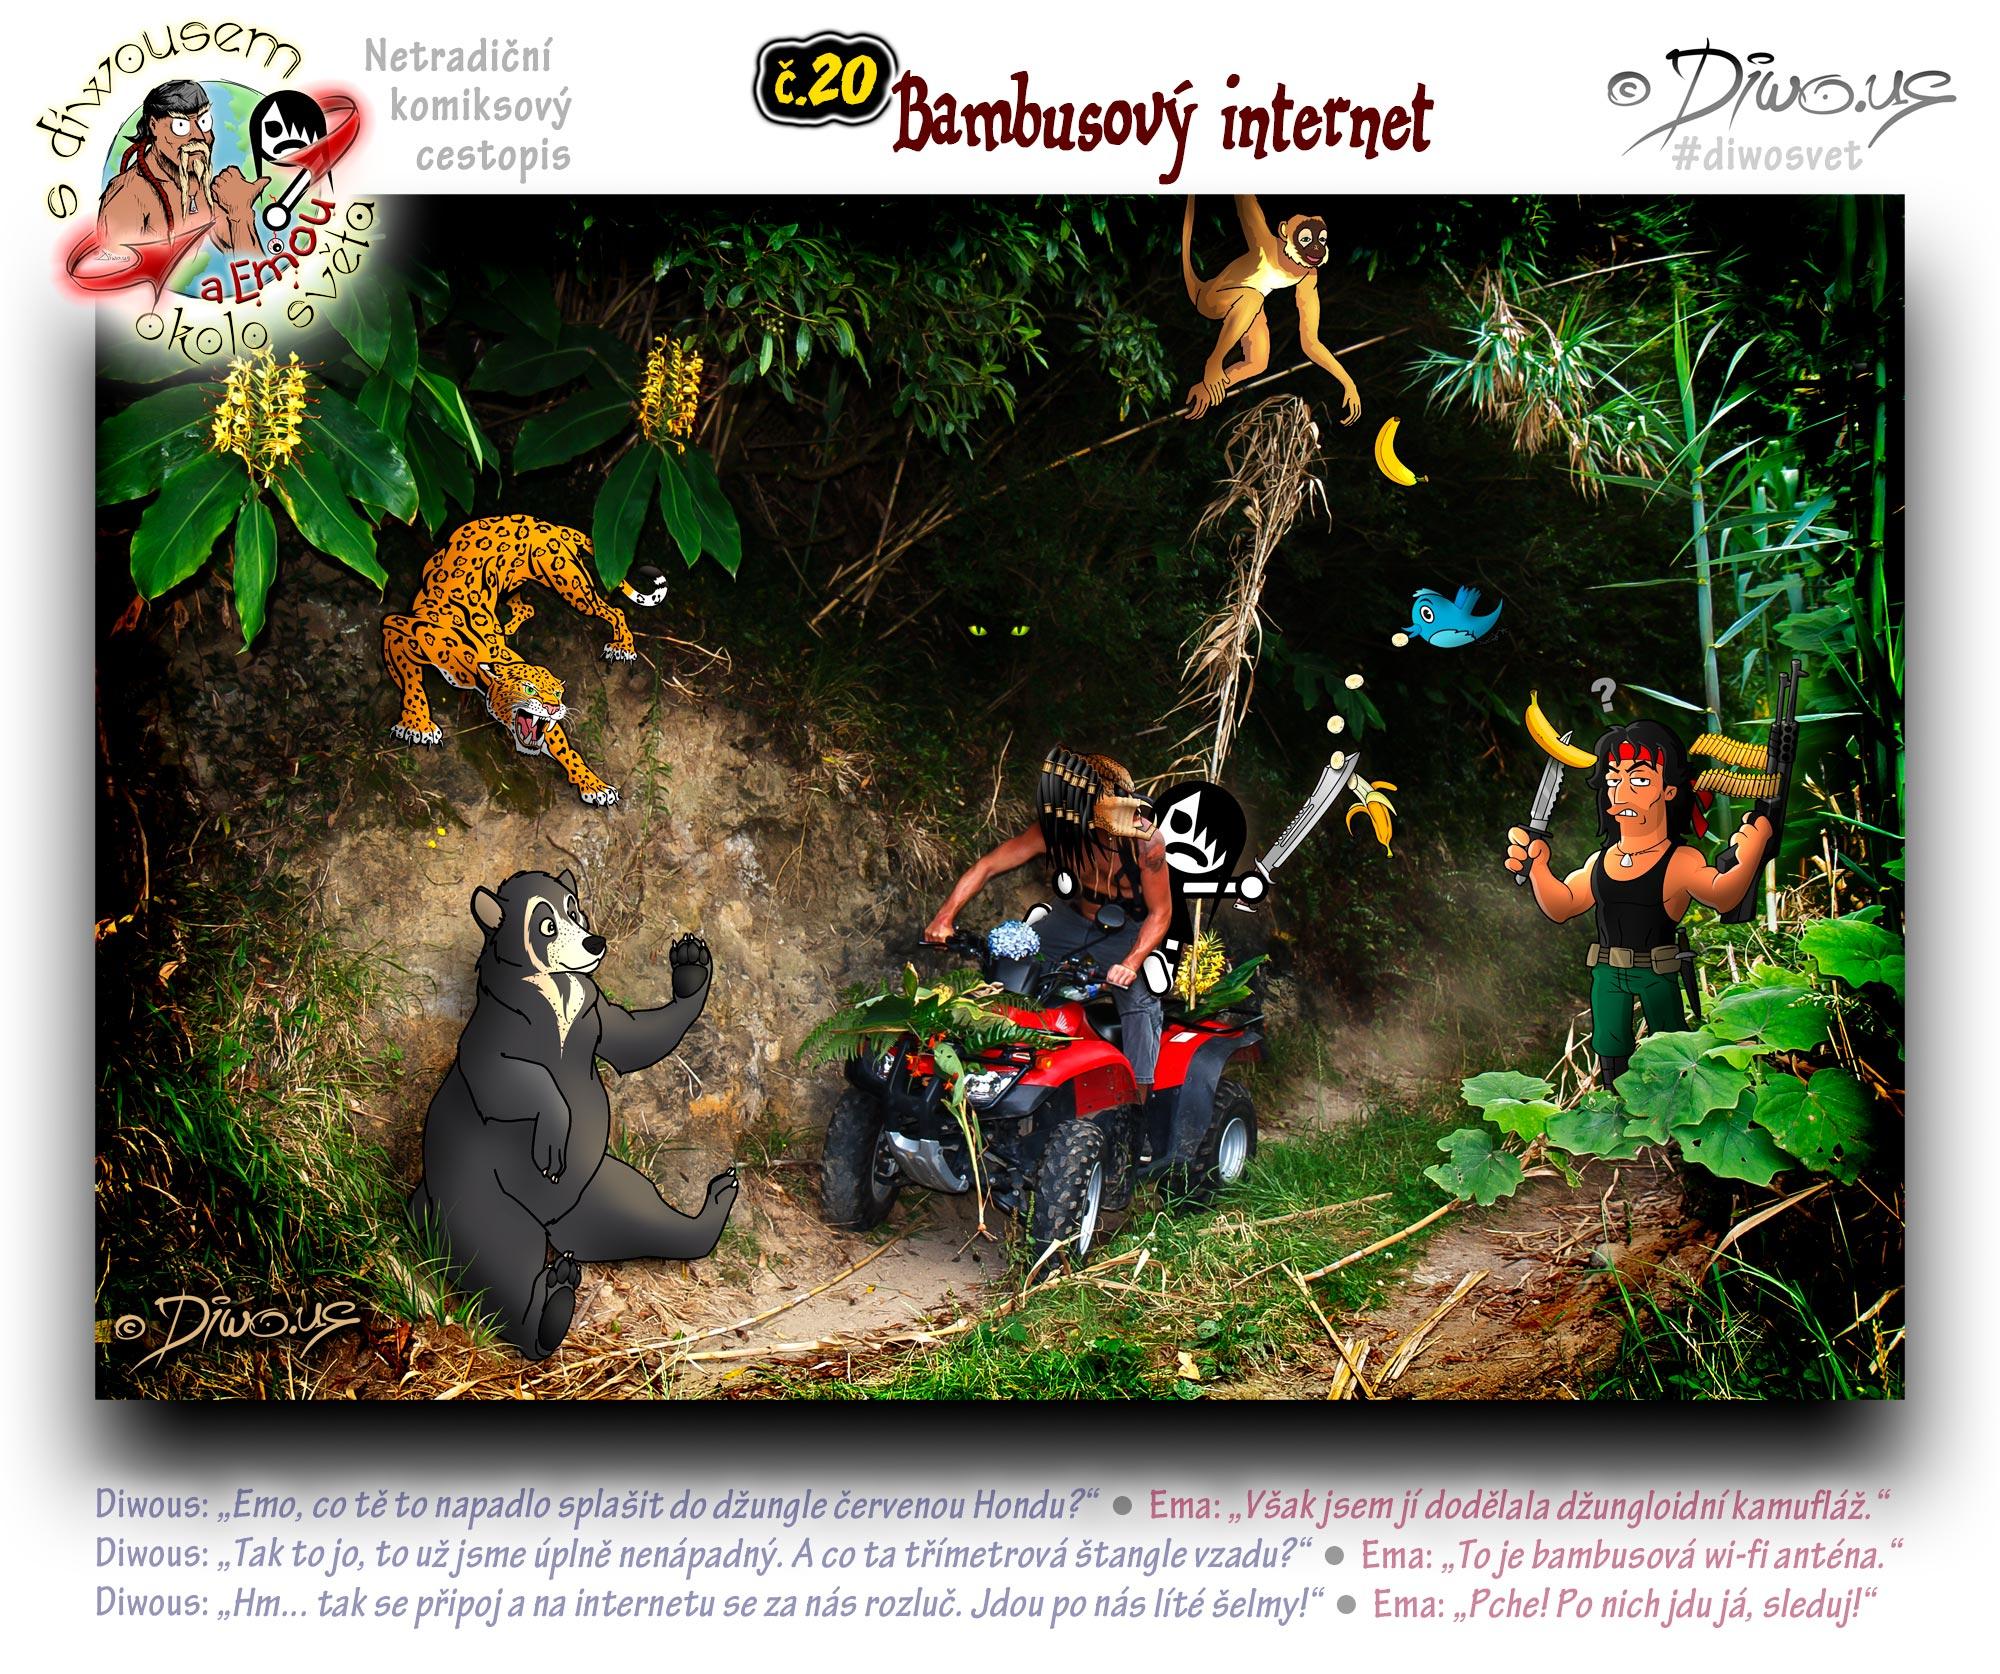 Diwous - netradiční komiksový cestopis, Ema, džungle, bambus, hortenzie květ, wi-fi anténa, jaguár, medvěd brýlatý, chápan, Cvrliky, modrý ptáček, Twitter logo, banán, John Rambo, útočná puška, taktický nůž, mačeta, čtyřkolka, Honda FourTrax 300, kamufláž, helma Predátor, šelma, Spectacled bear, Spider monkey, hydrangea bloom, bamboo, blue bird, banana, tactical knife, machete, assault rifle, quad, ATV, Sylvester Stallone, camouflage, Predator helmet, beast